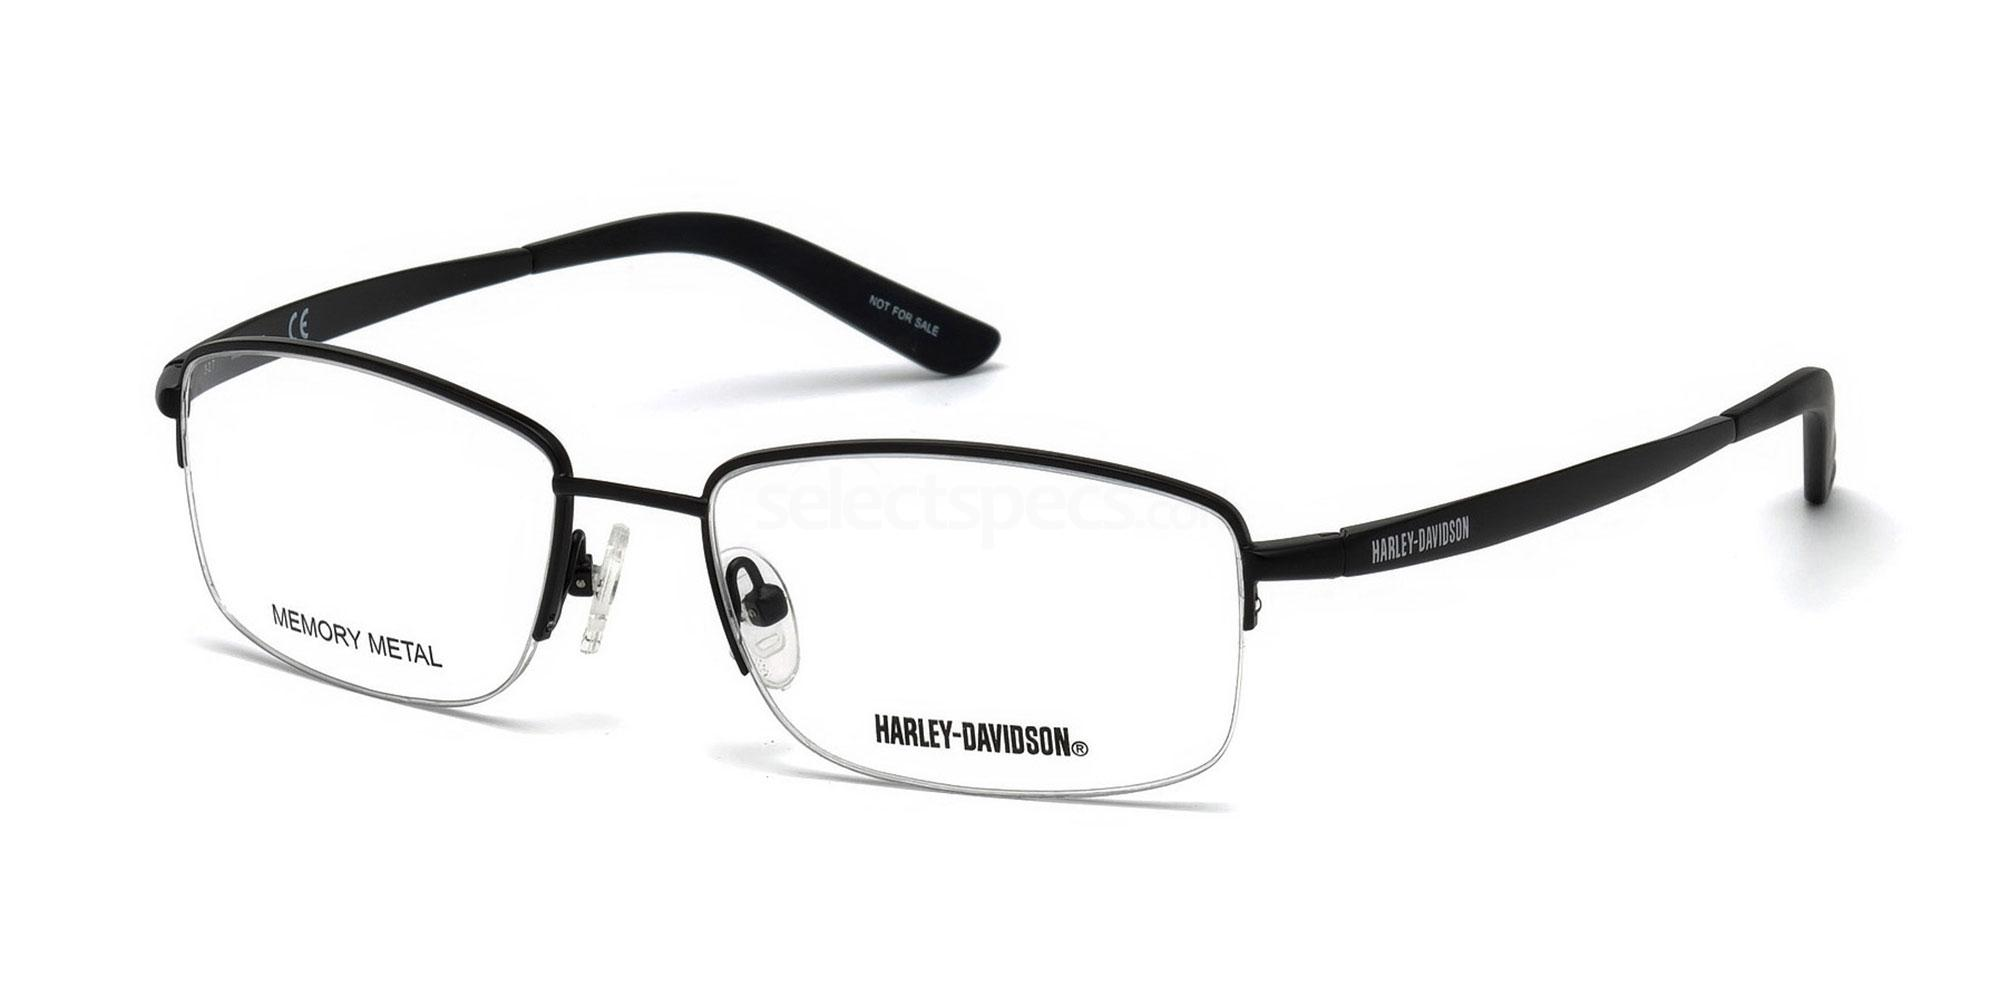 002 HD0771 Glasses, Harley Davidson